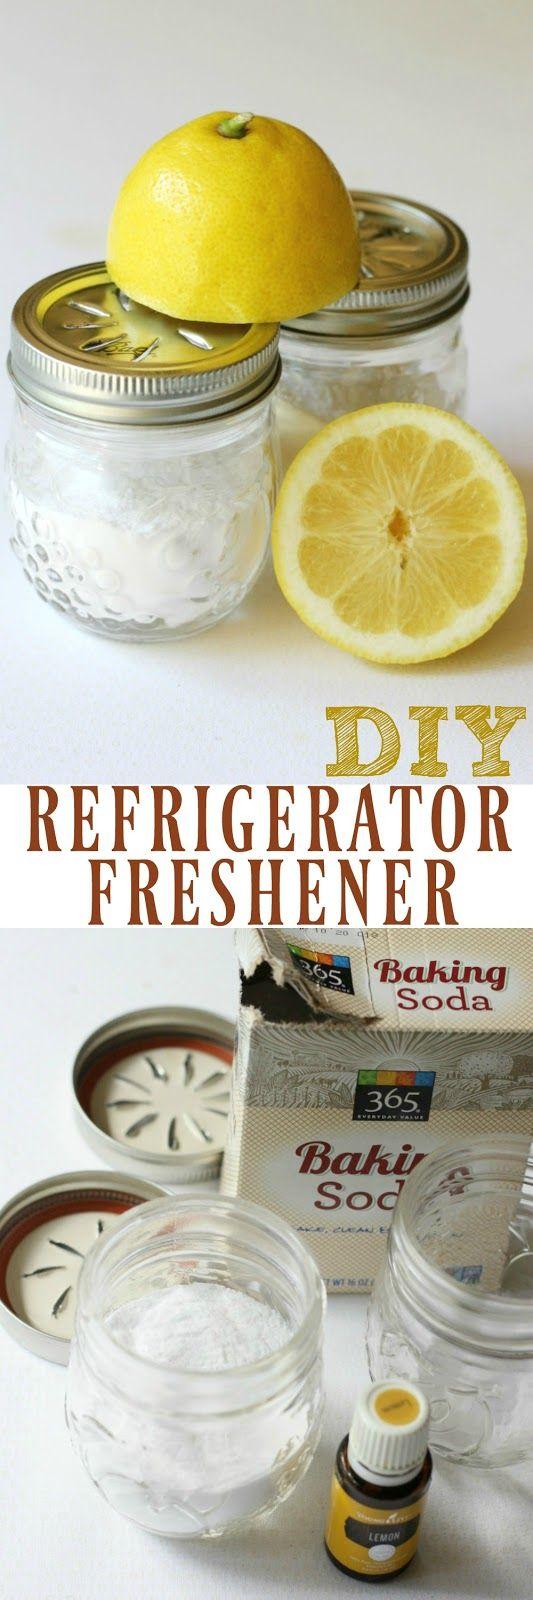 Diy Refrigerator Freshener Freshener Diy Diy Cleaning Products